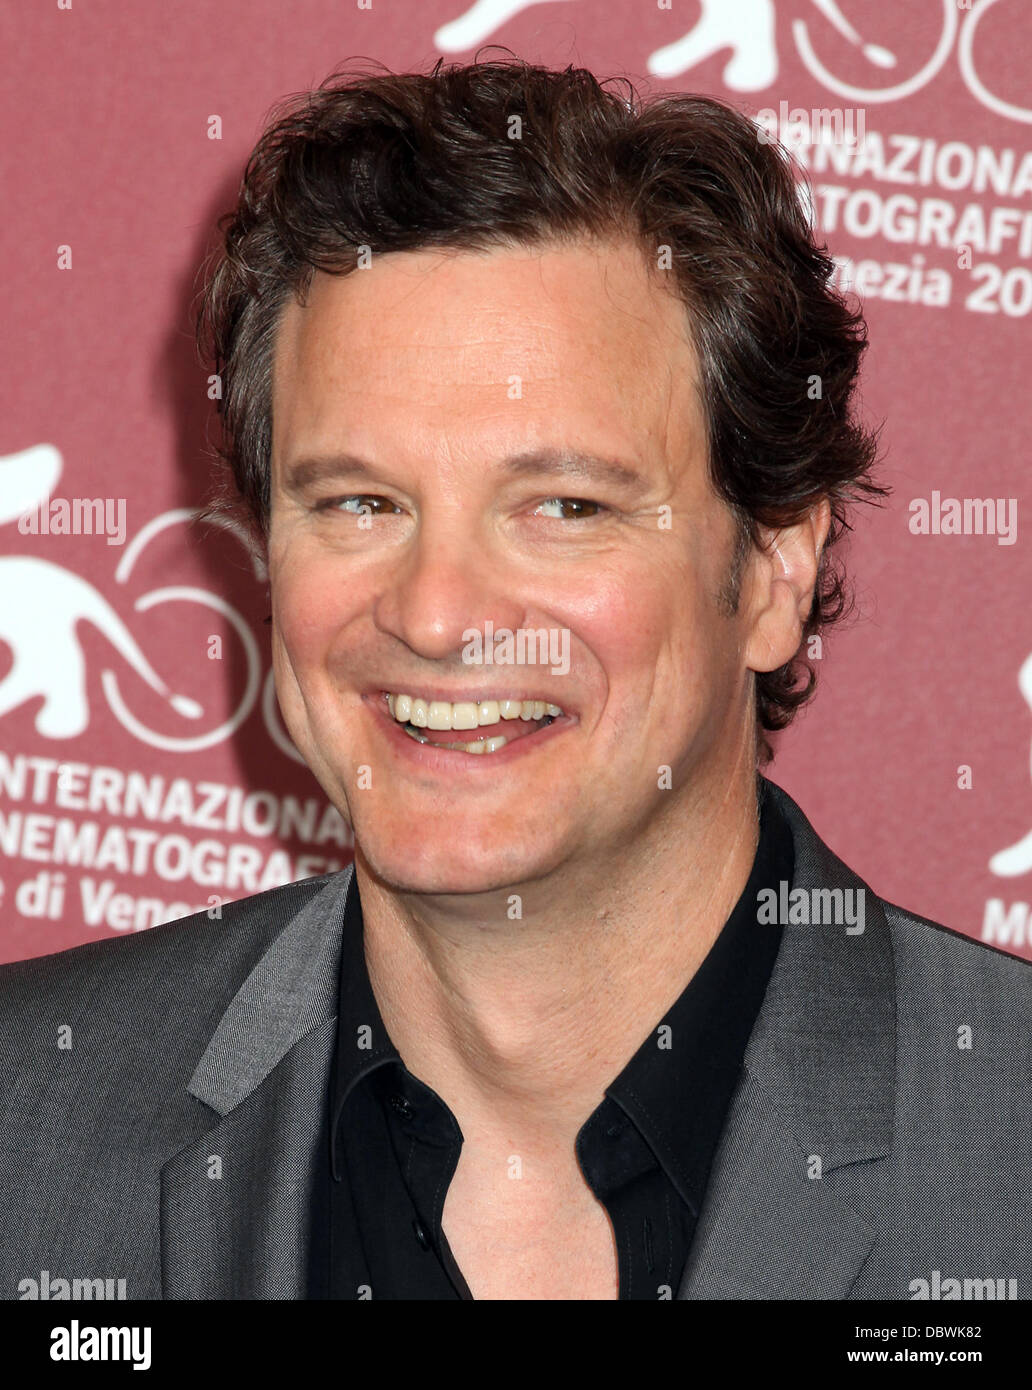 Colin Firth der 68. Venedig Film Festival - Tag 6 - Tinker, Tailor, Soldier, Spy - Photocall Venedig, Italien - Stockbild